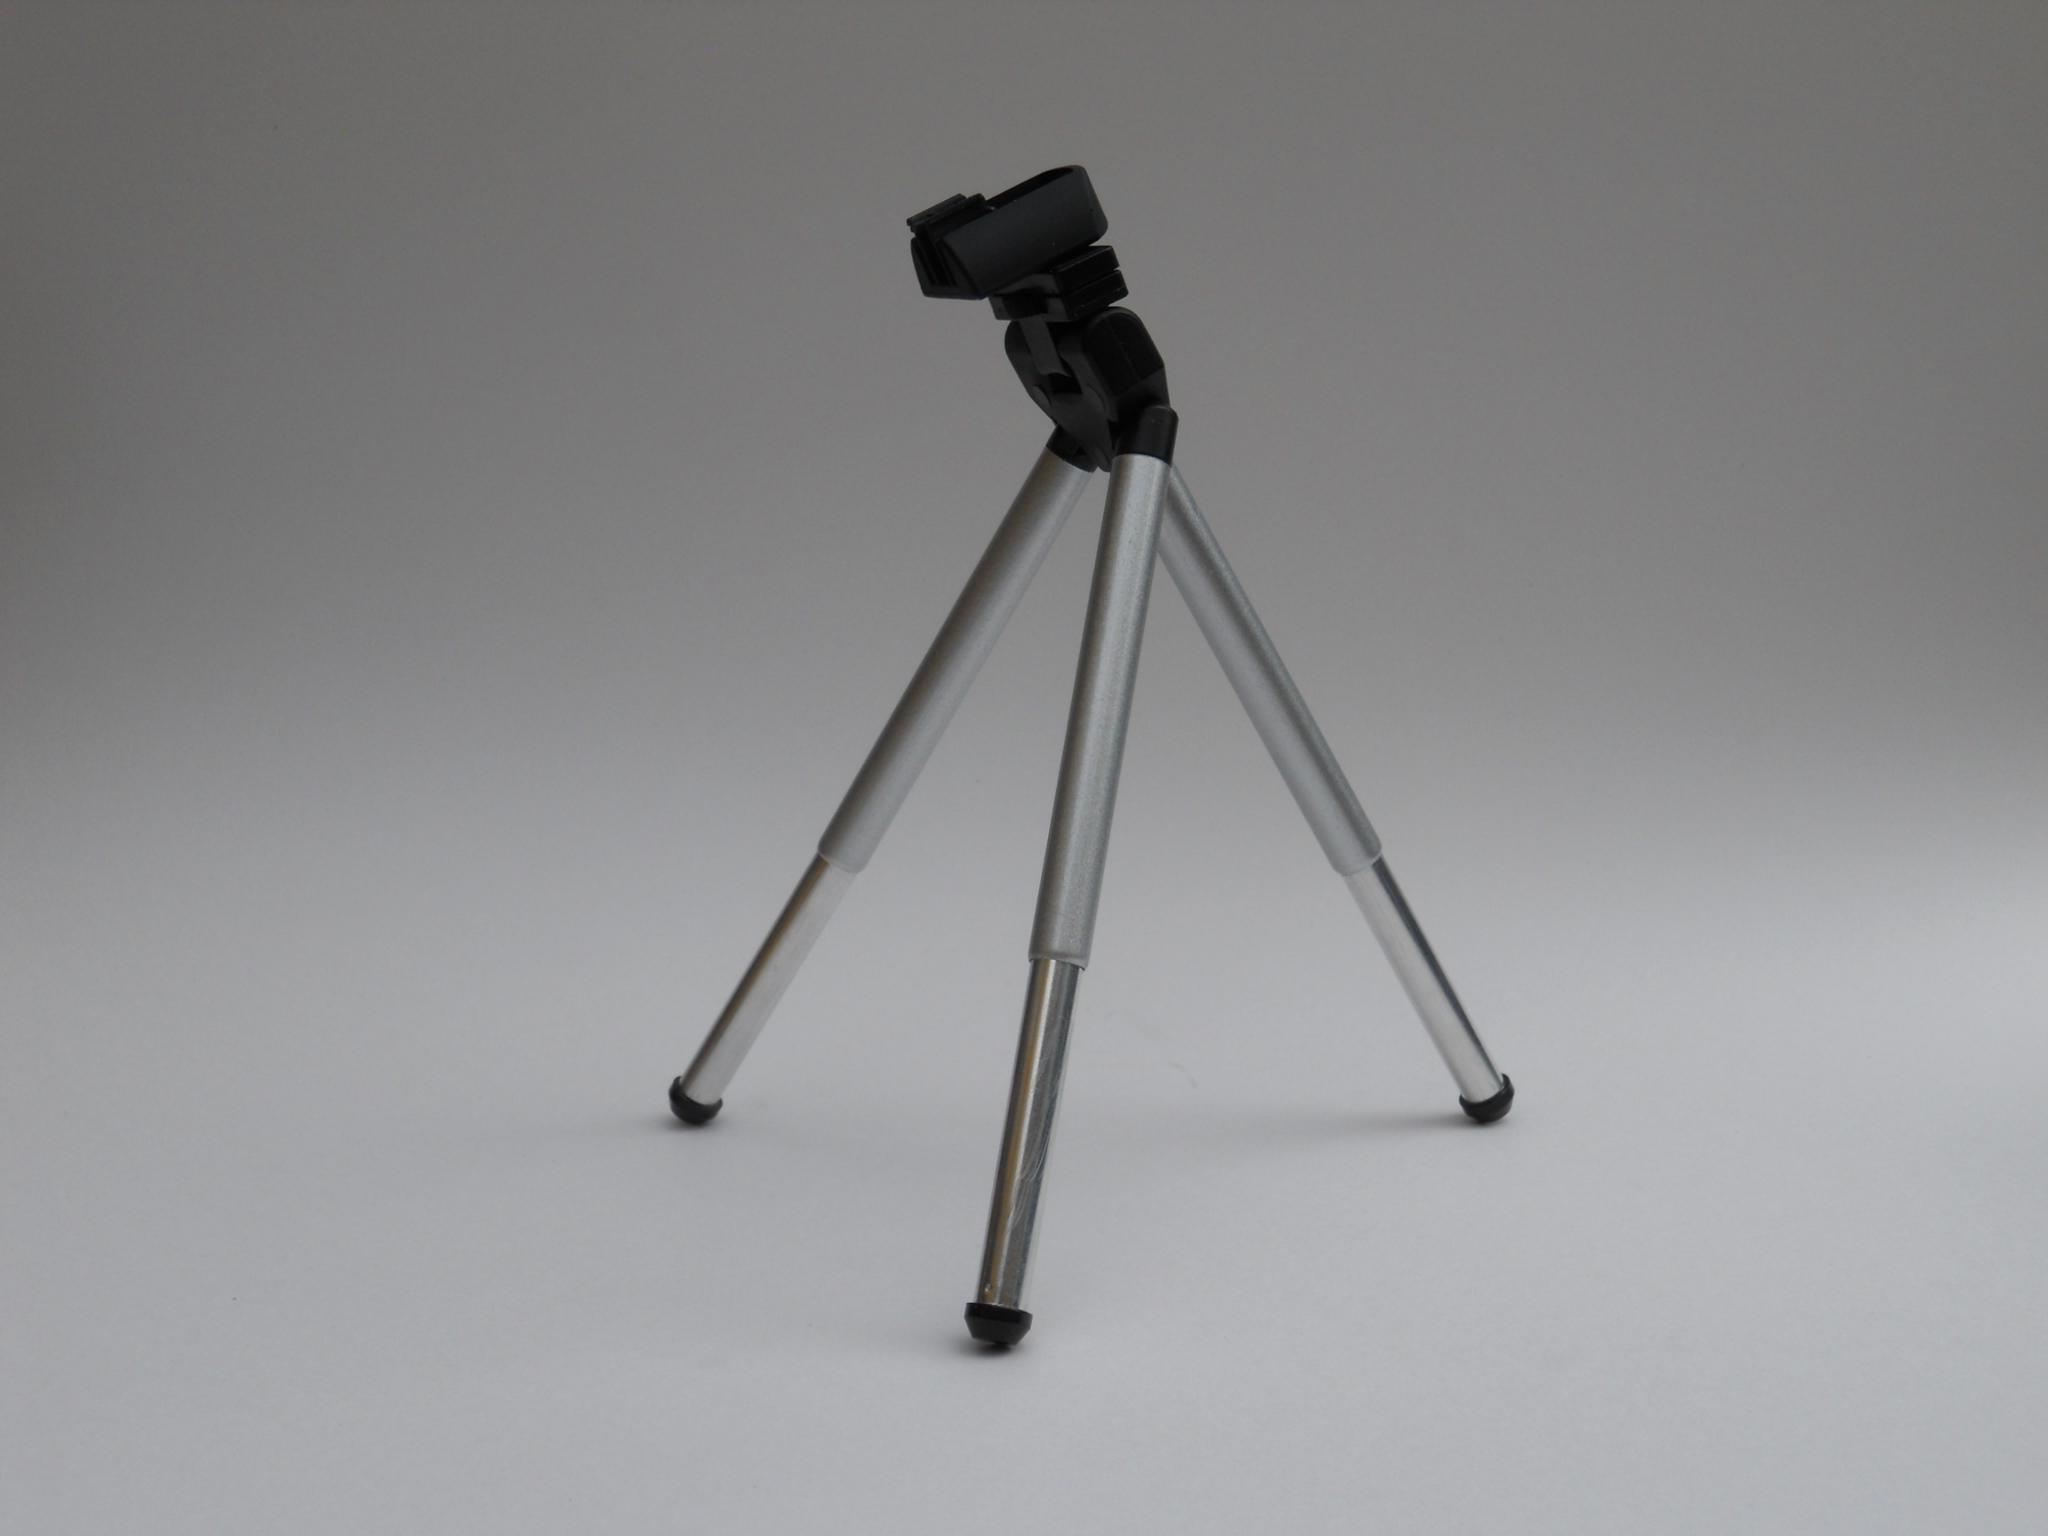 Firefly mini tripod - Aceessoires Microscopes USB Firefly